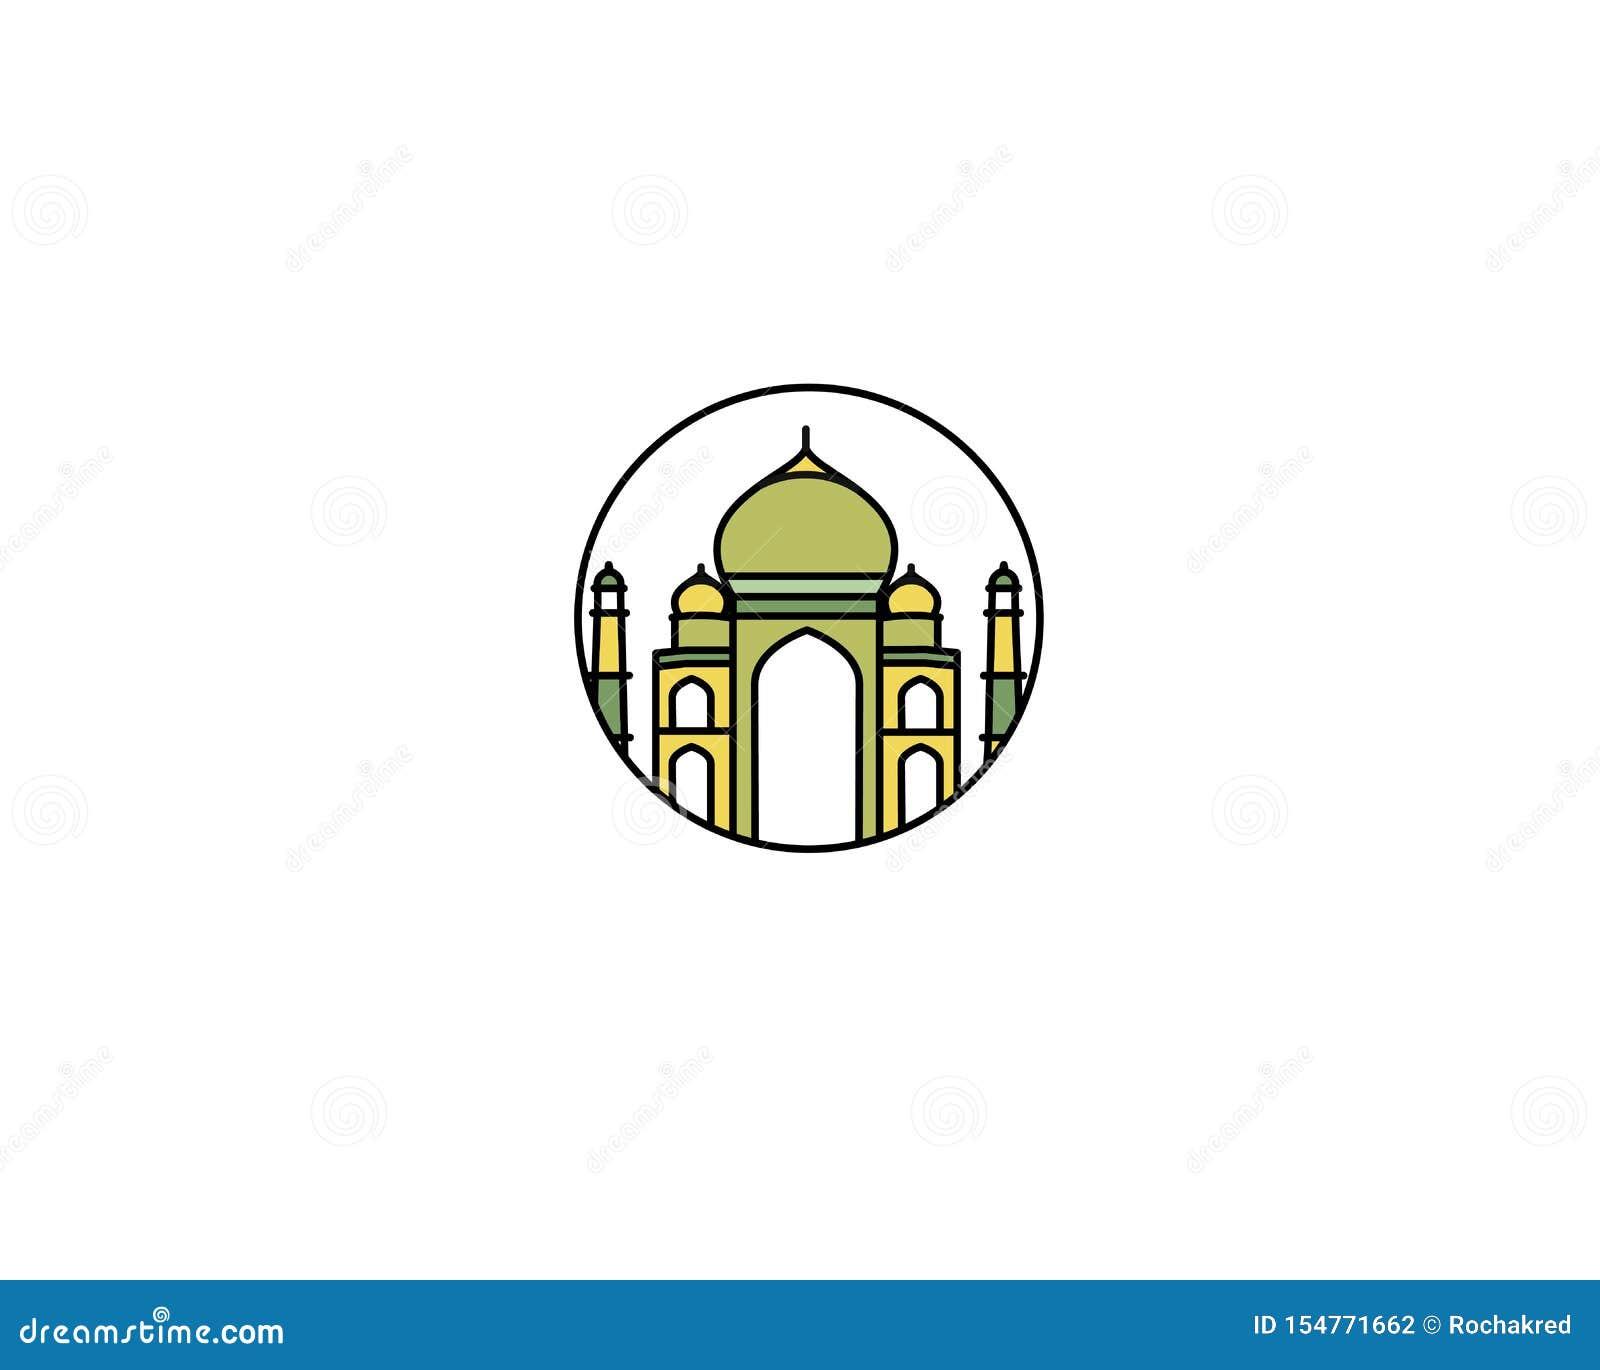 Taj Mahal Hand Drawn, India Agra